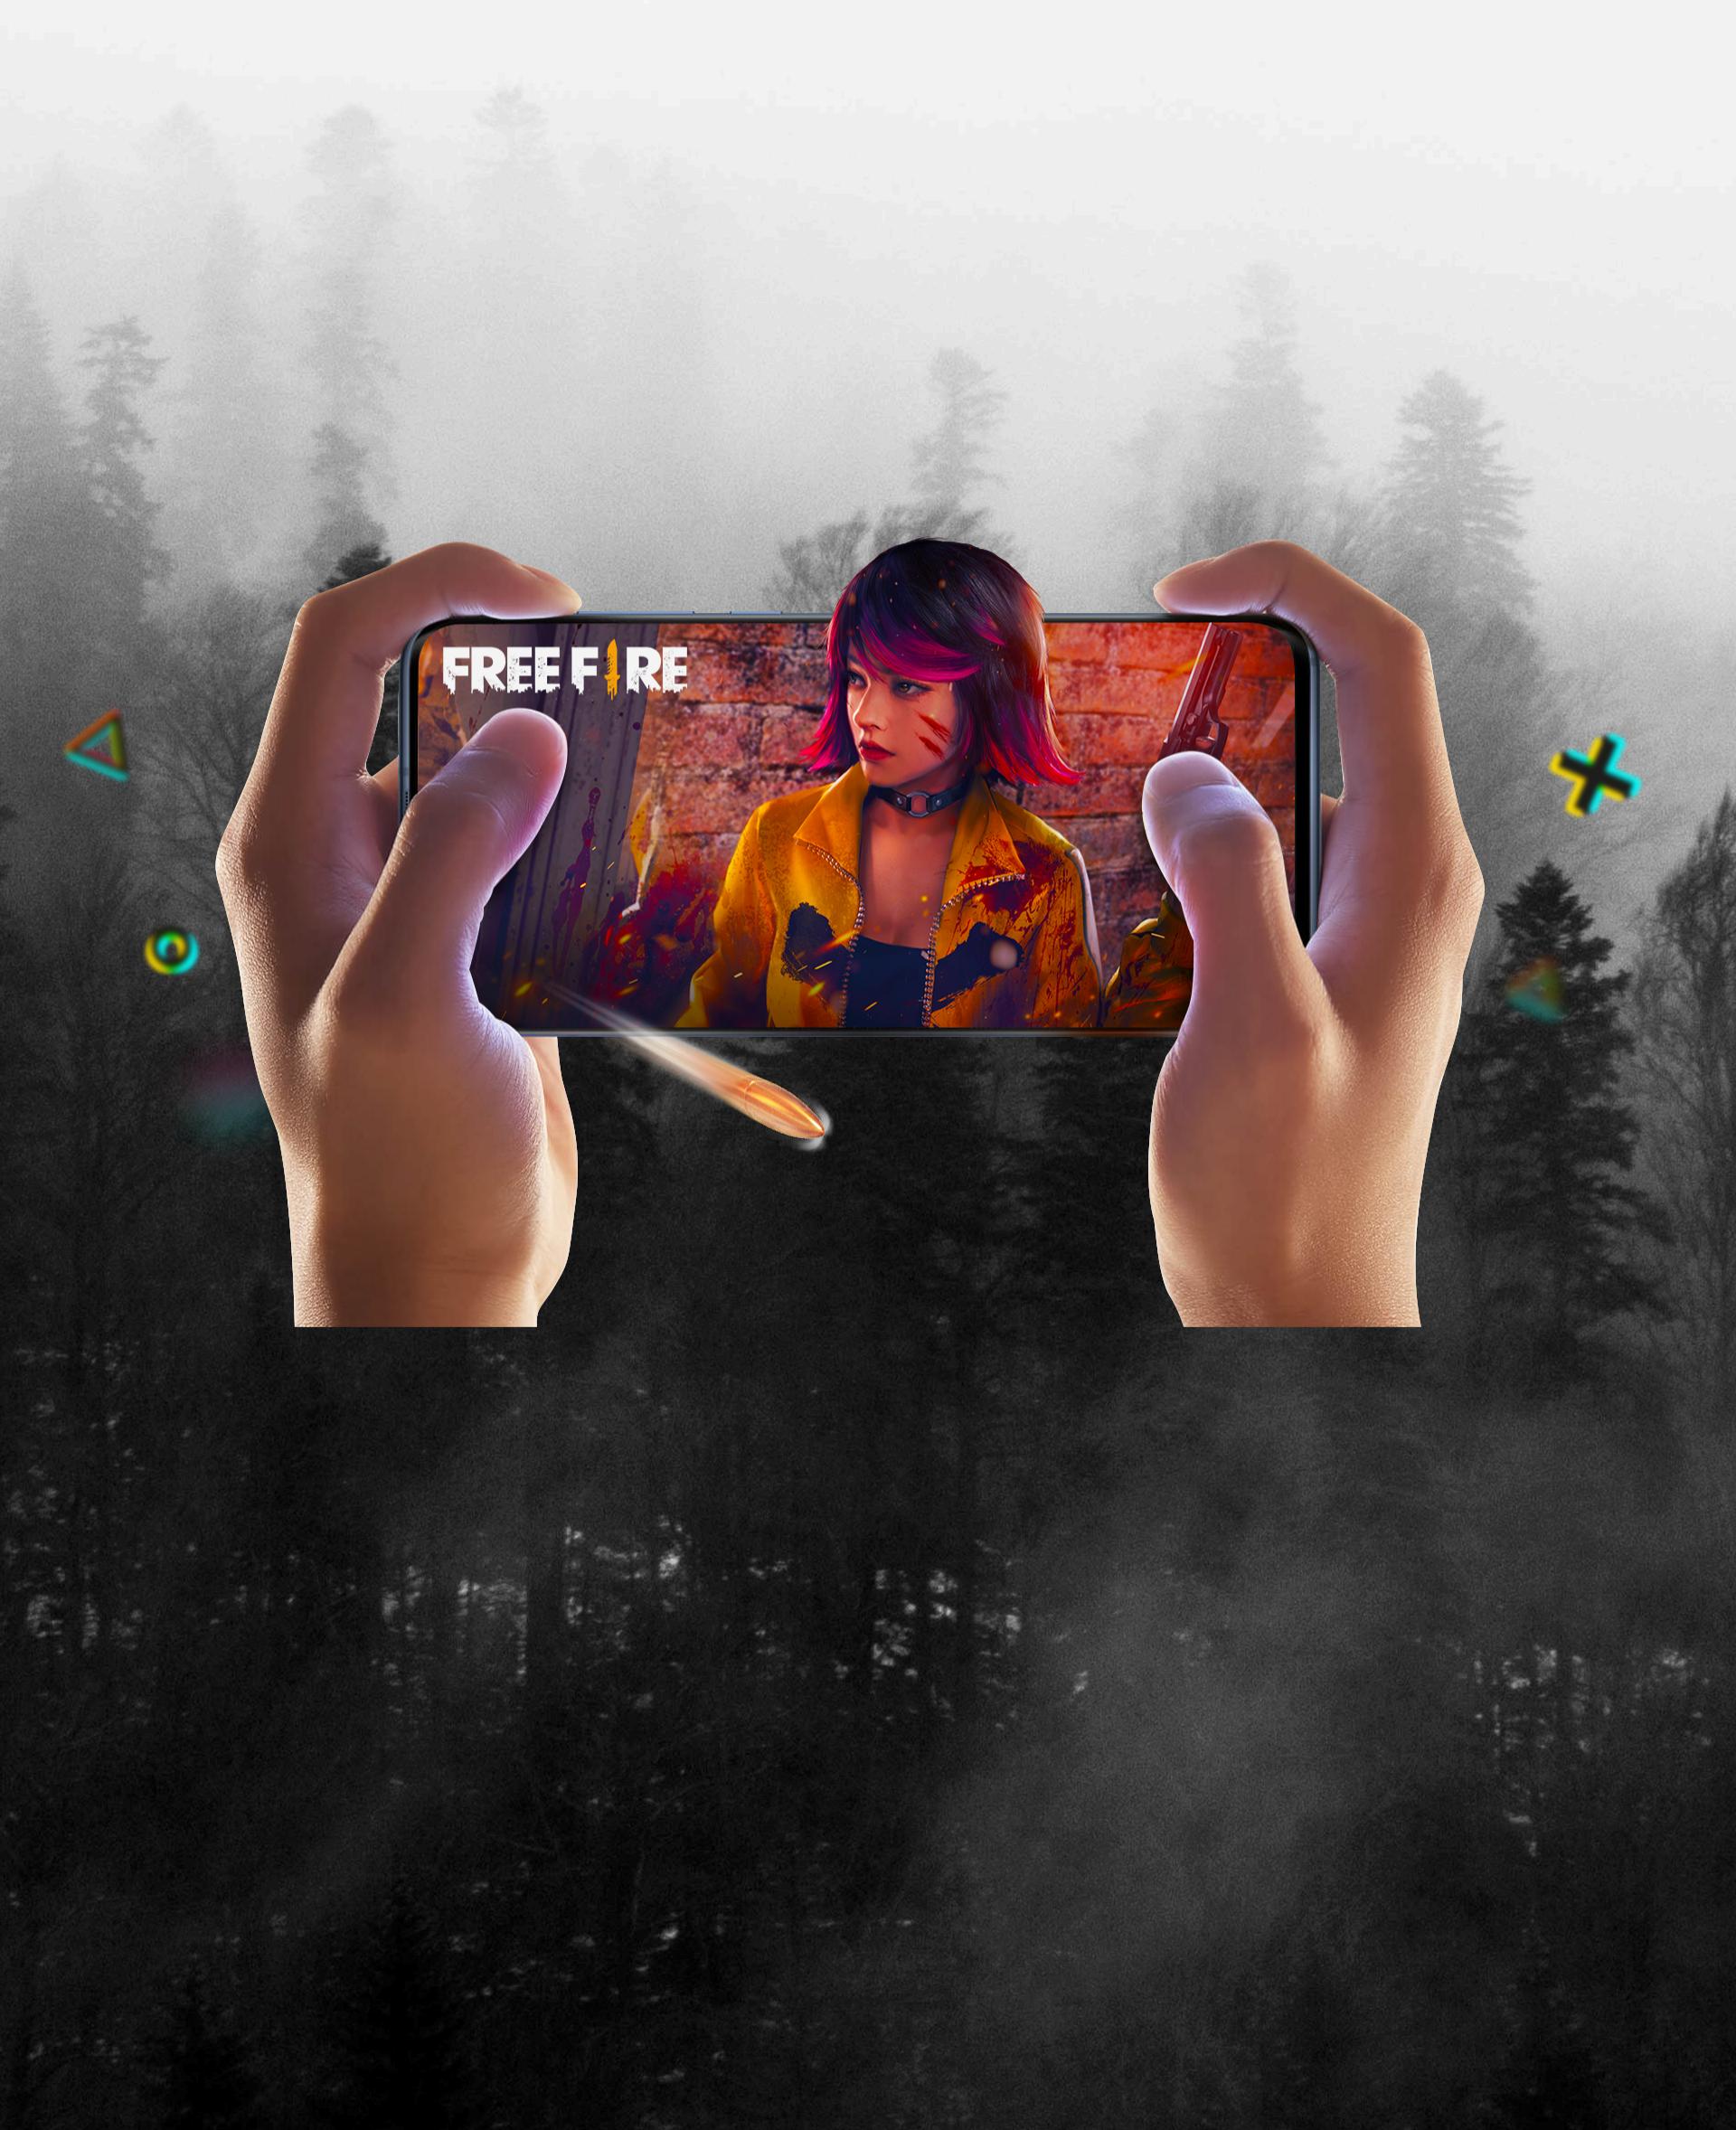 free_fire-1